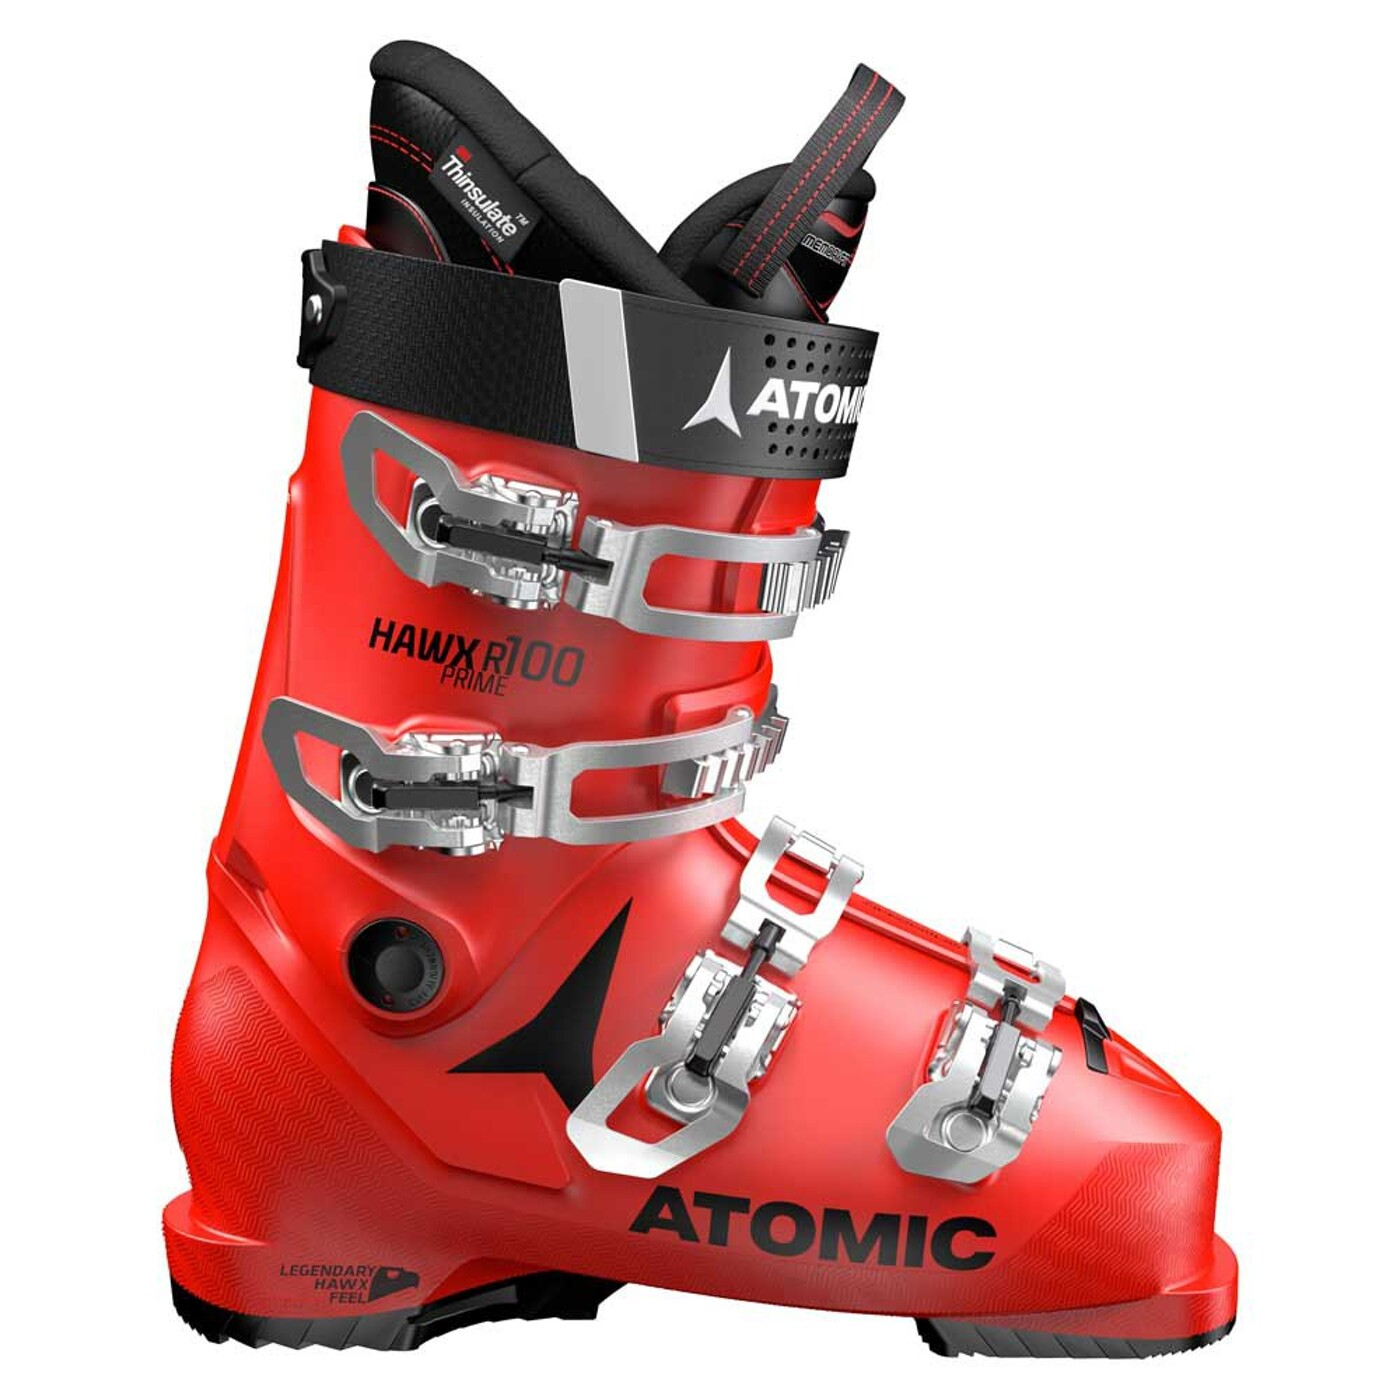 Skischuh HAWX PRIME R100 Red/Black Atomic - Herren